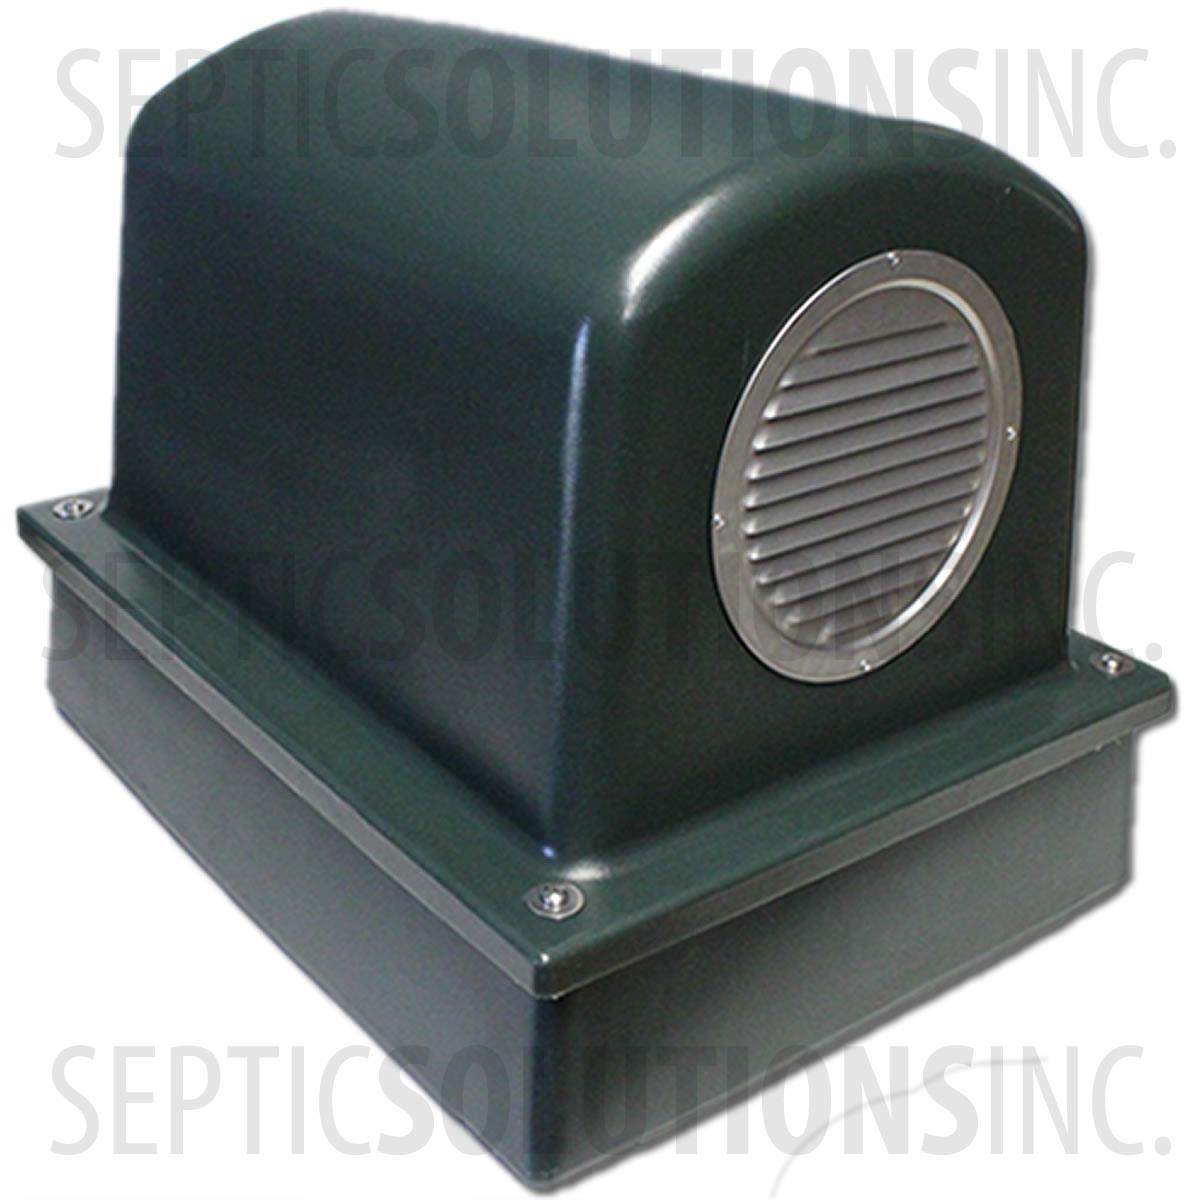 Forest Green Pump Protector Air Pump Housing And Platform